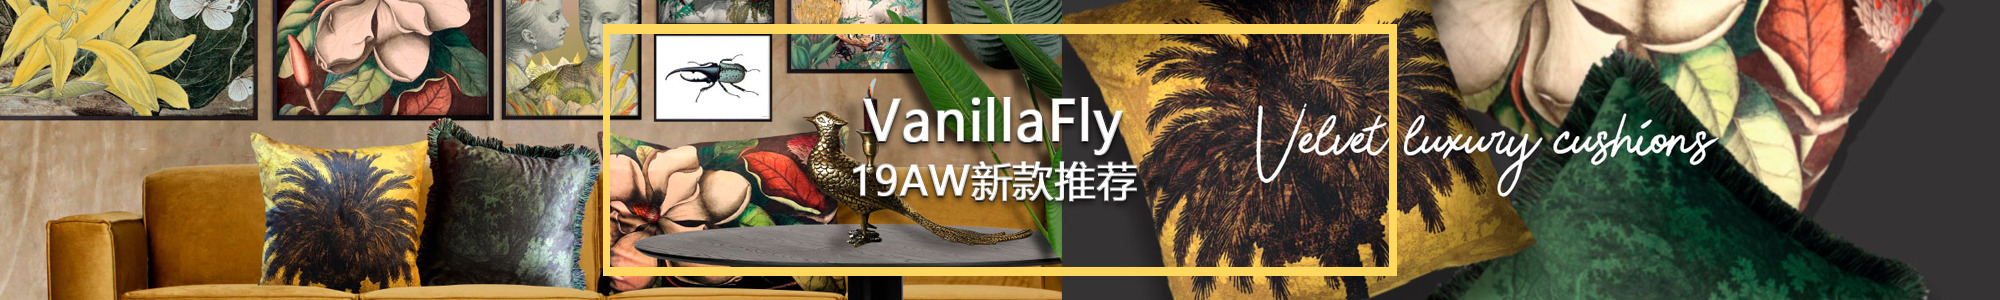 VanillaFly靠墊